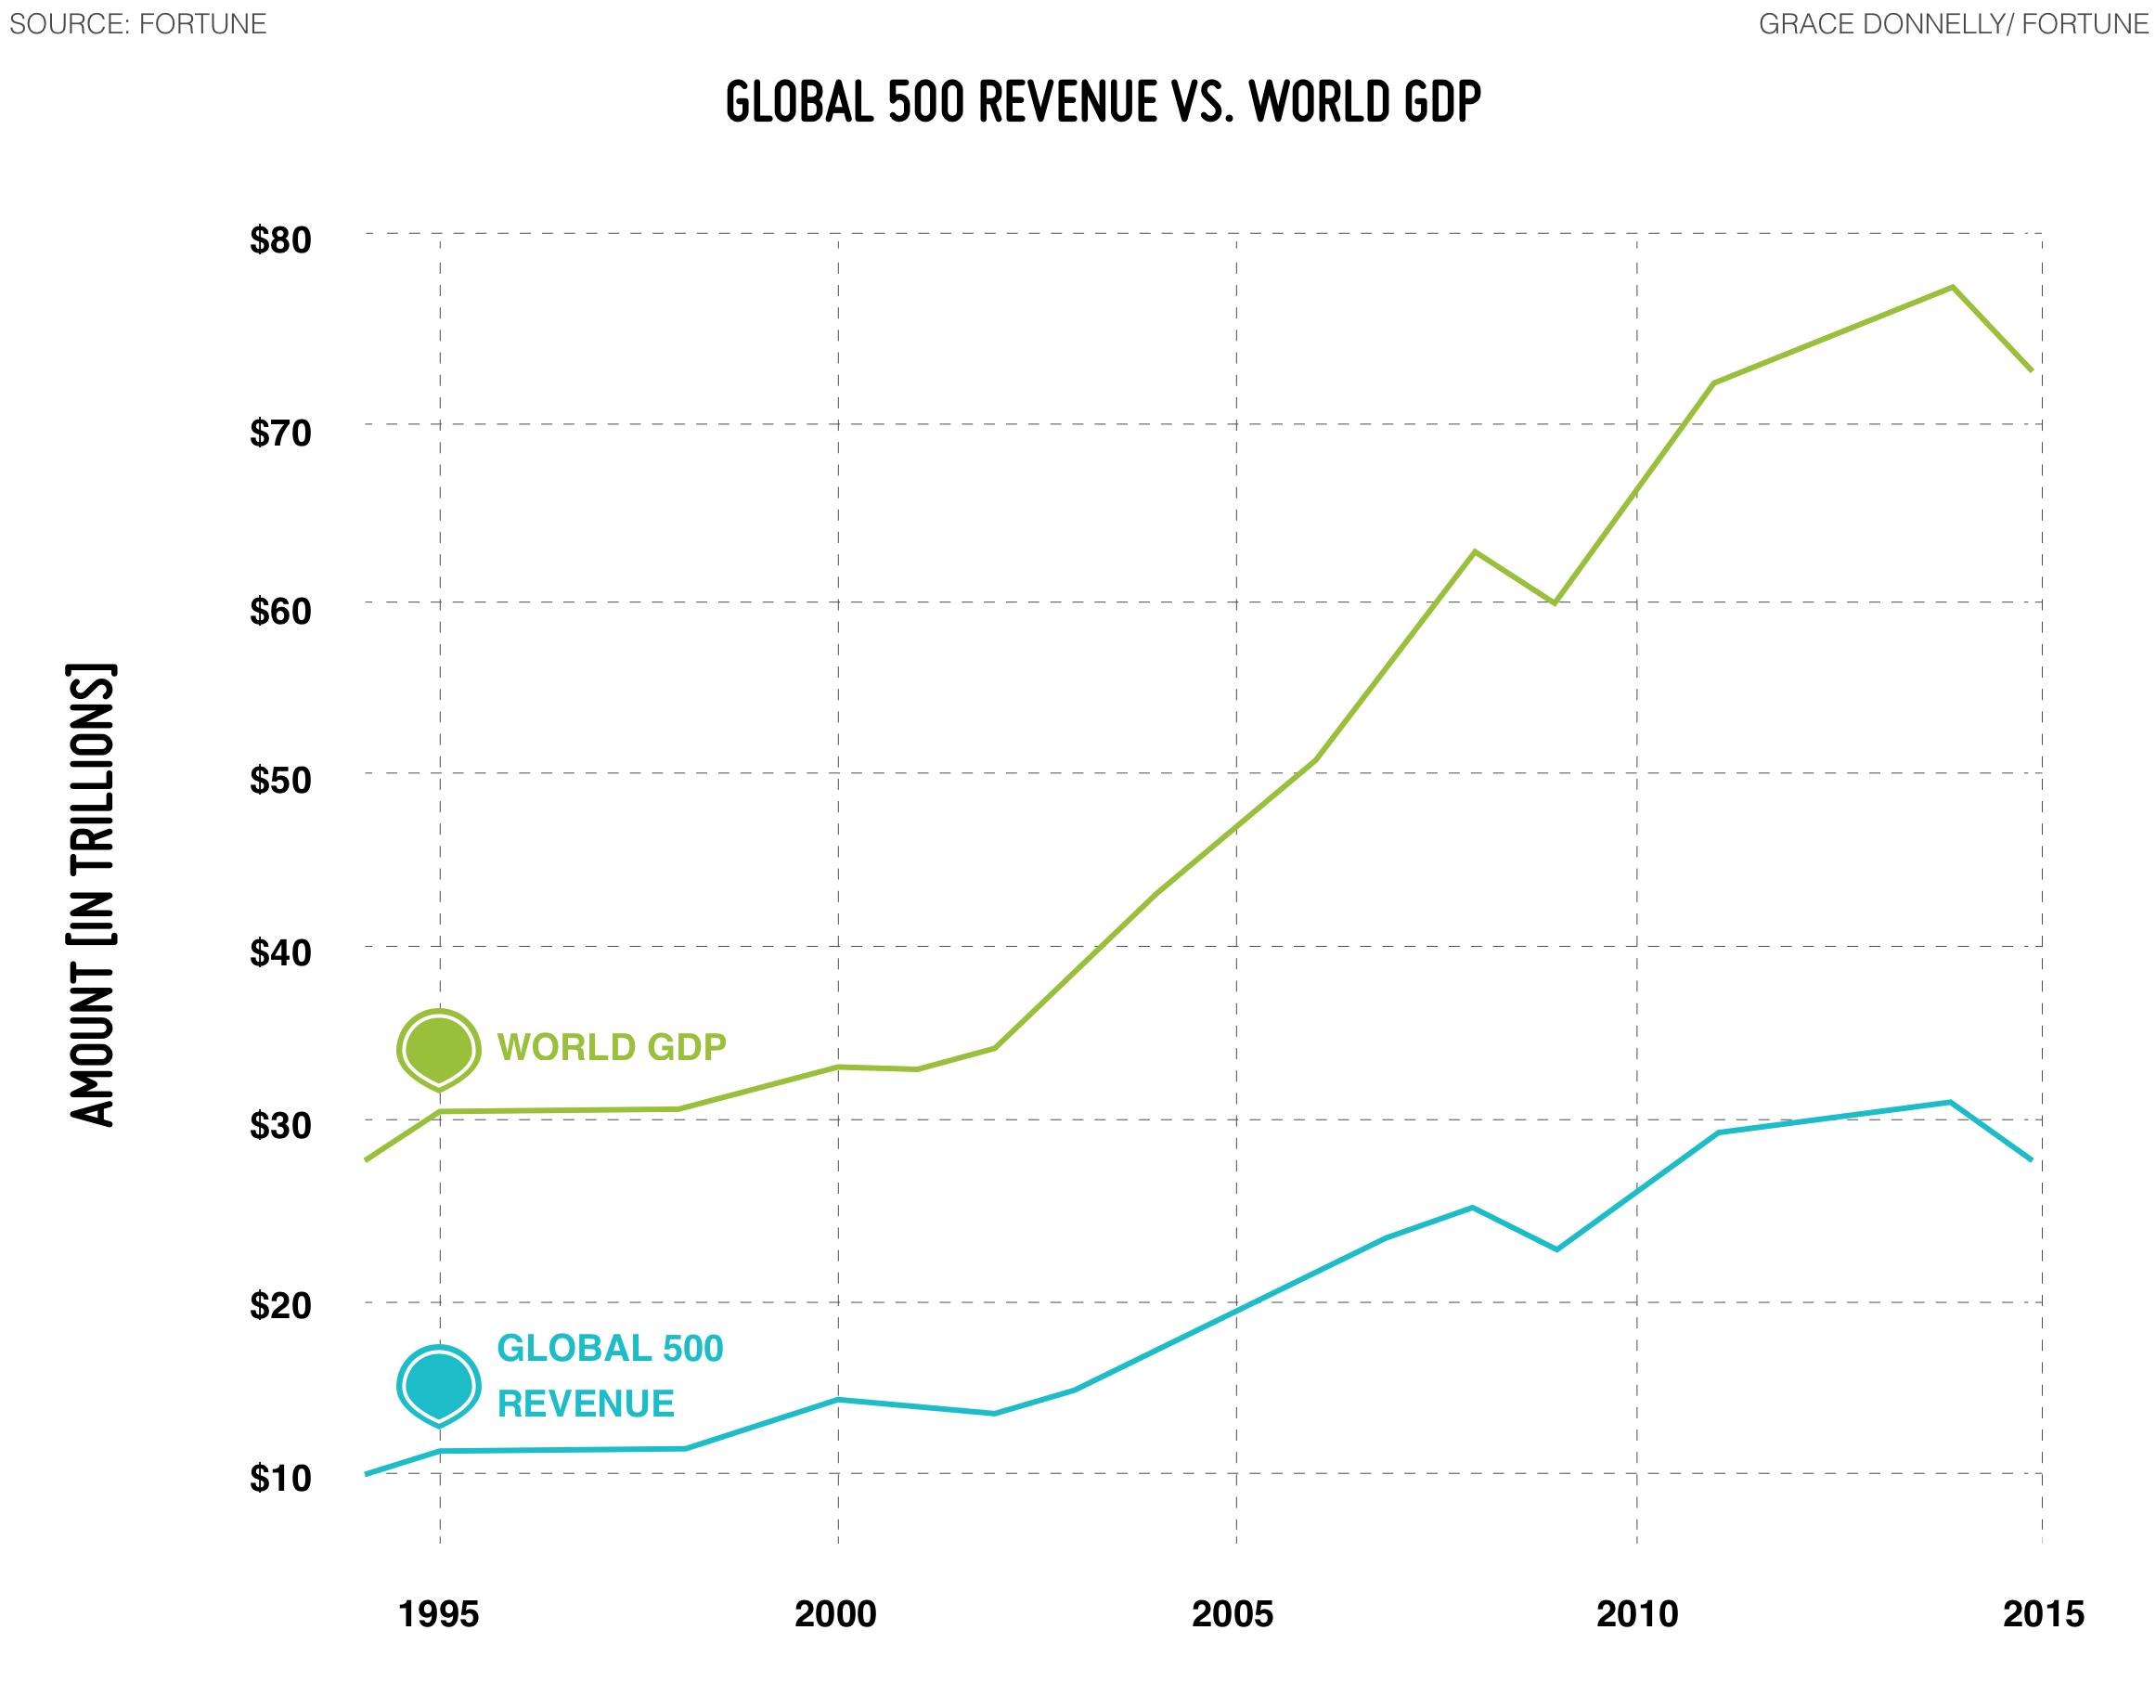 Global 500 revenue vs. World GDP Diagram